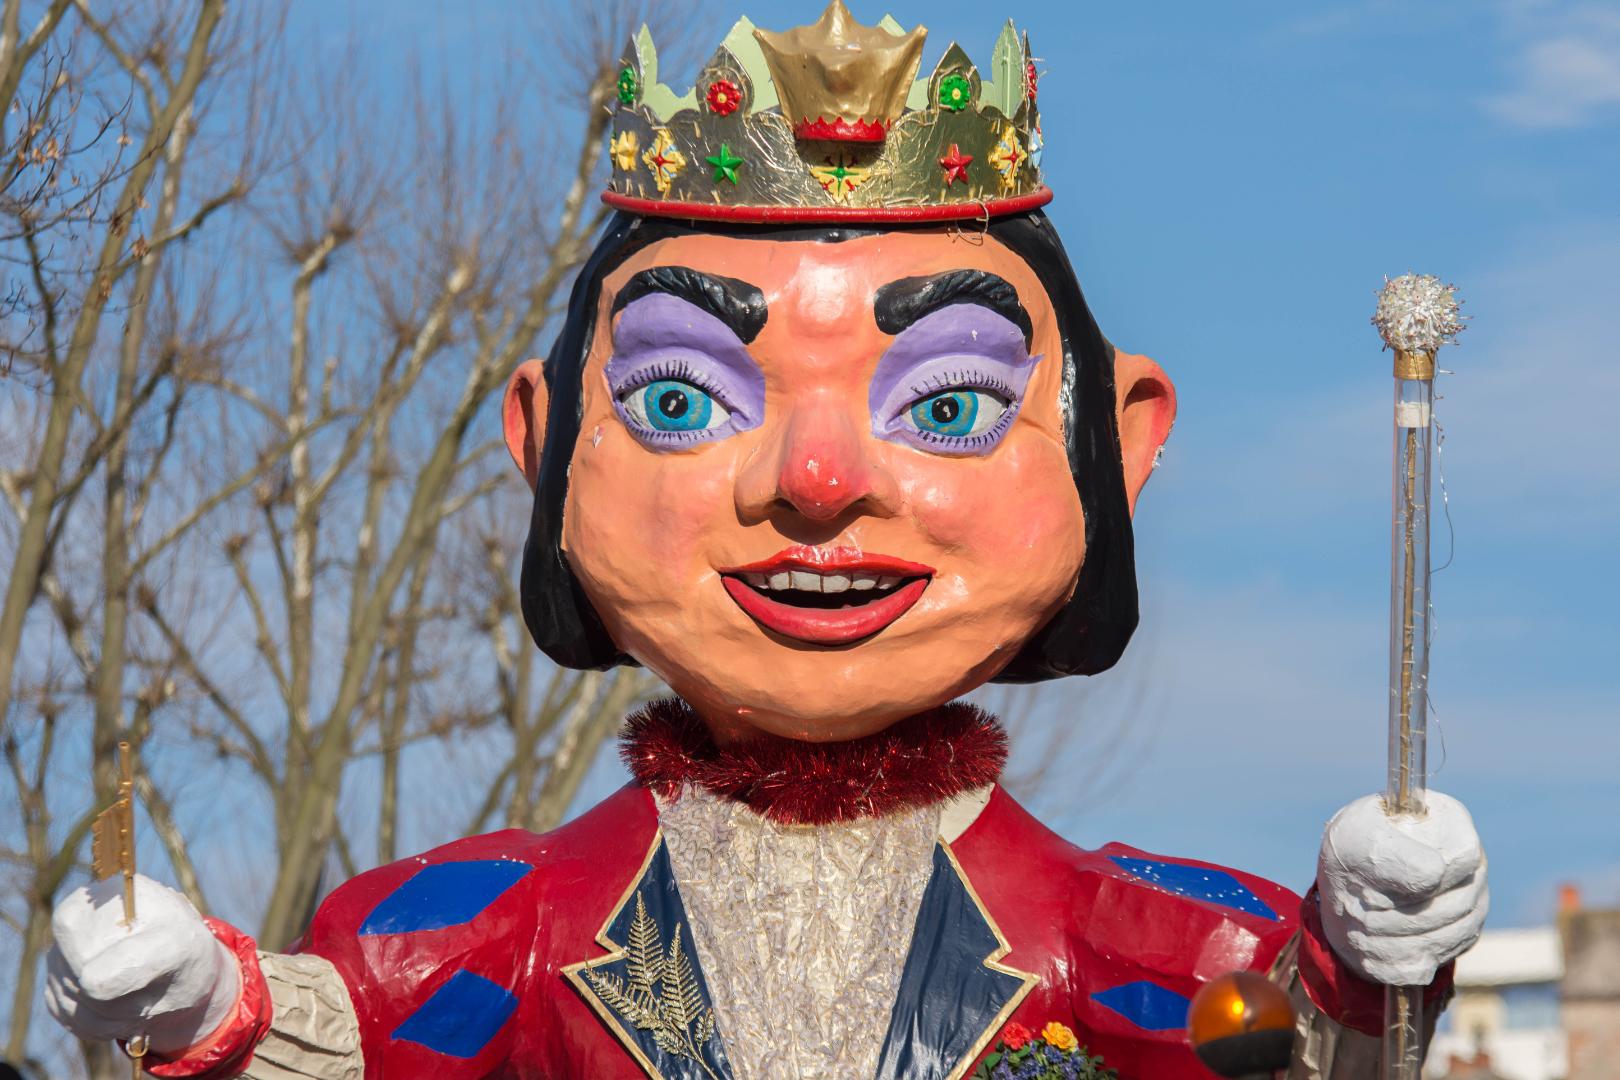 carnaval2019-1 (2021_02_07 10_18_26 UTC)